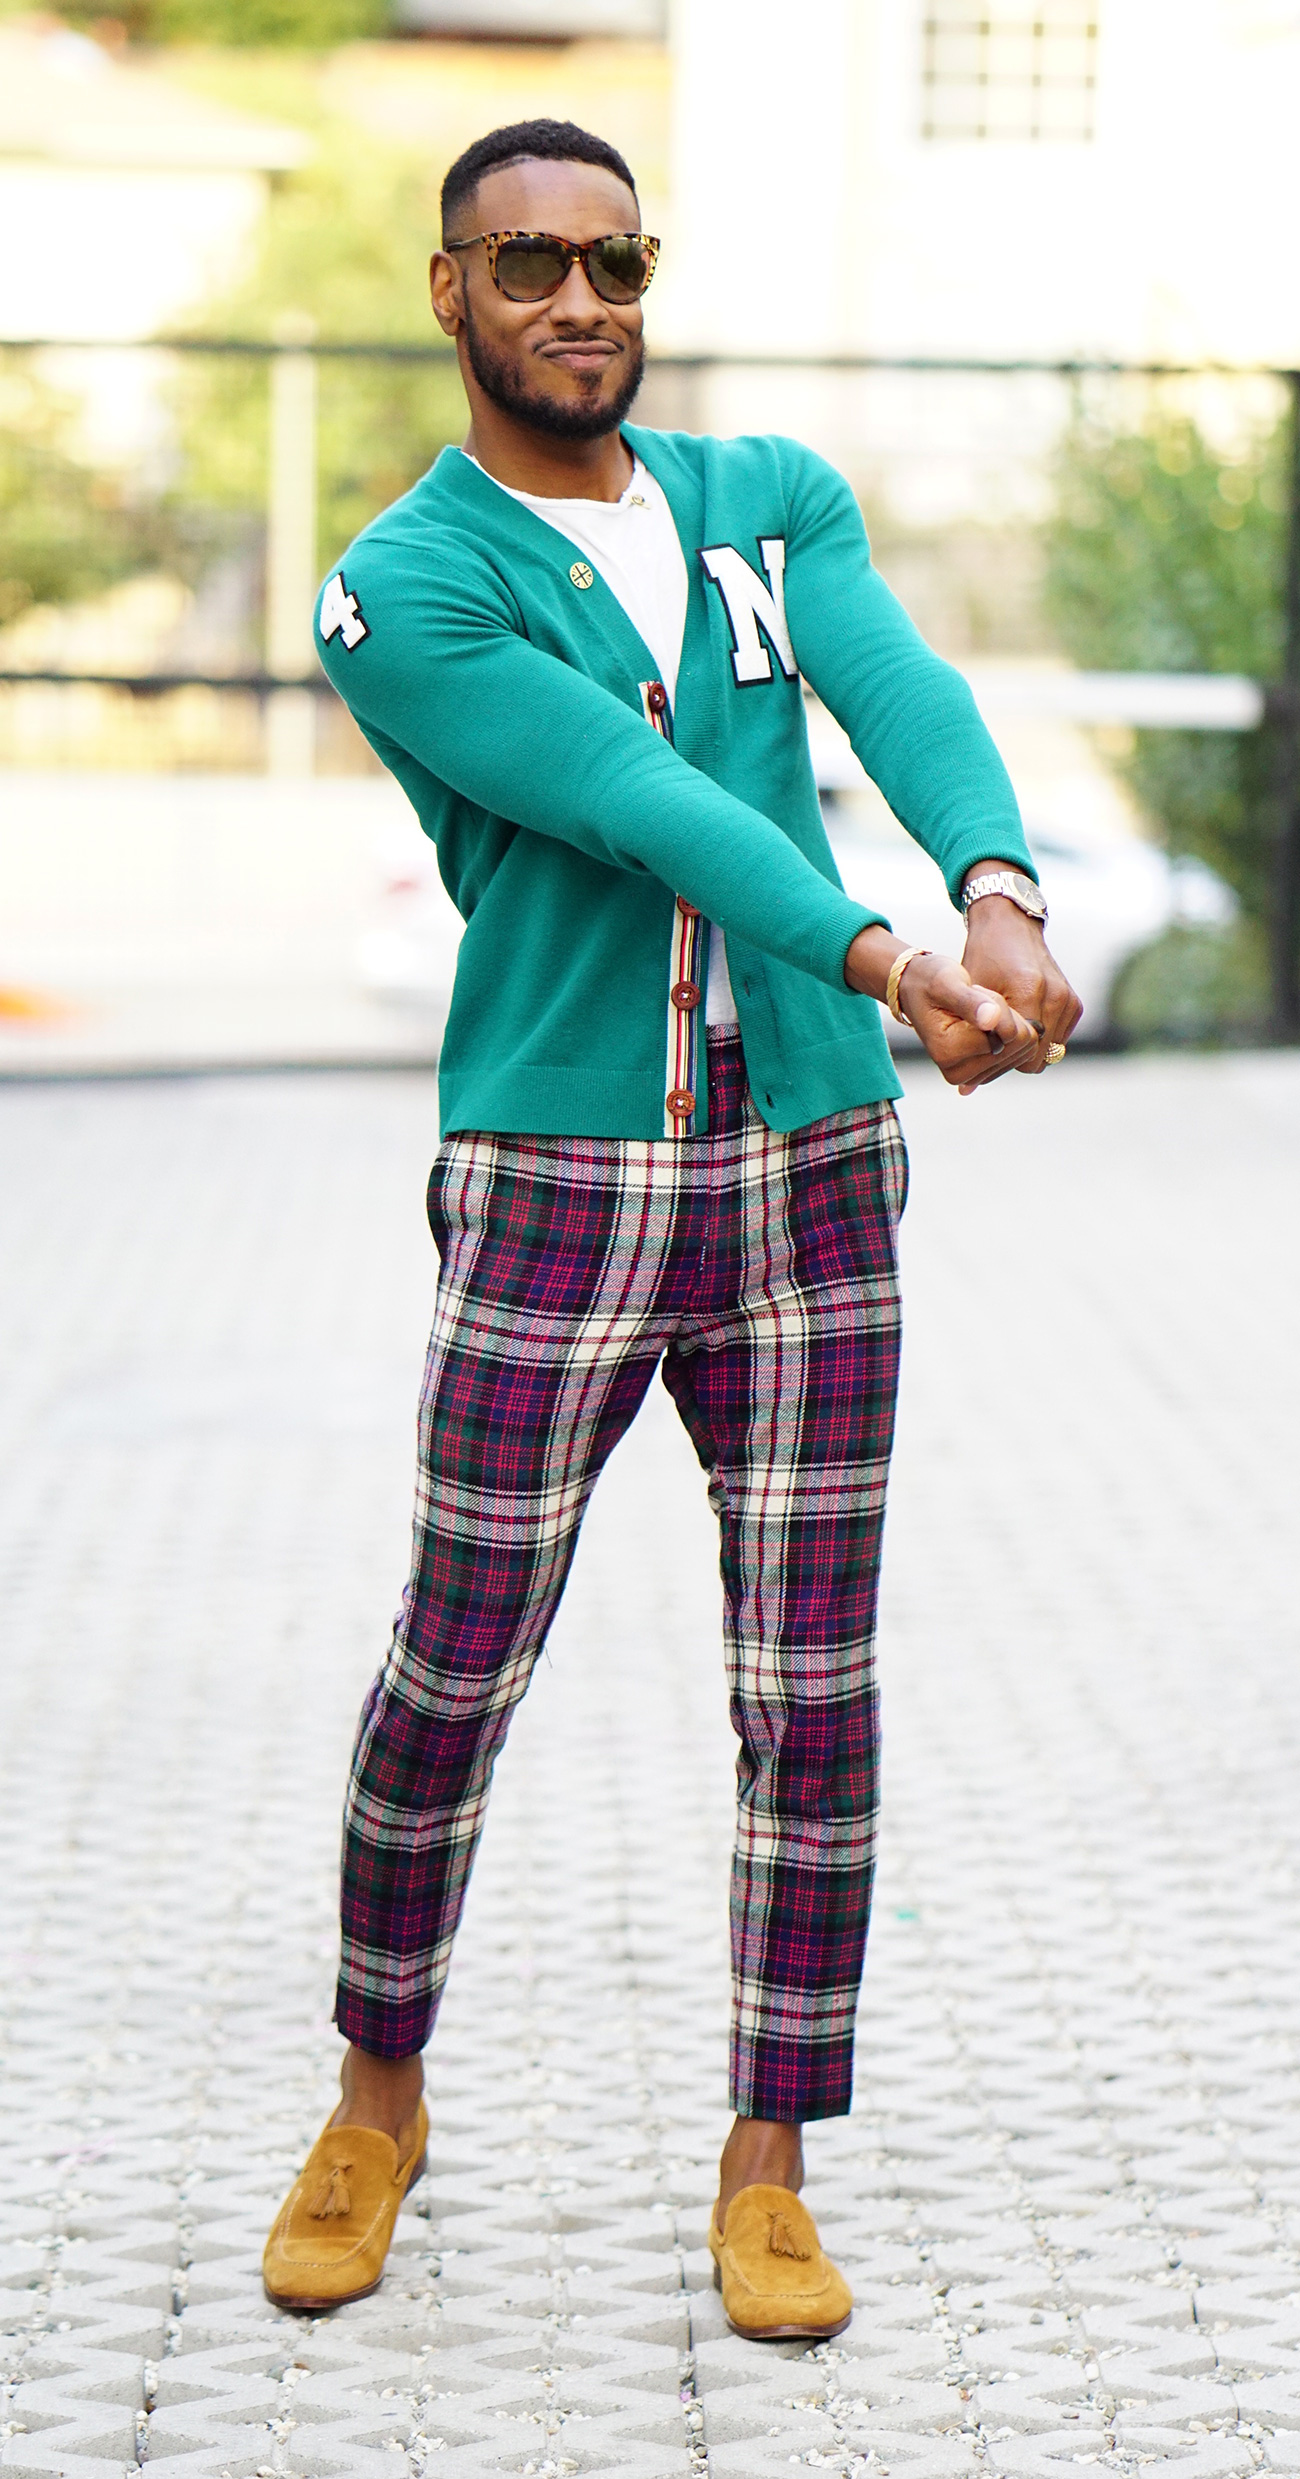 Diy Ivy League Cardigan Plaid Pants Loafers Norris